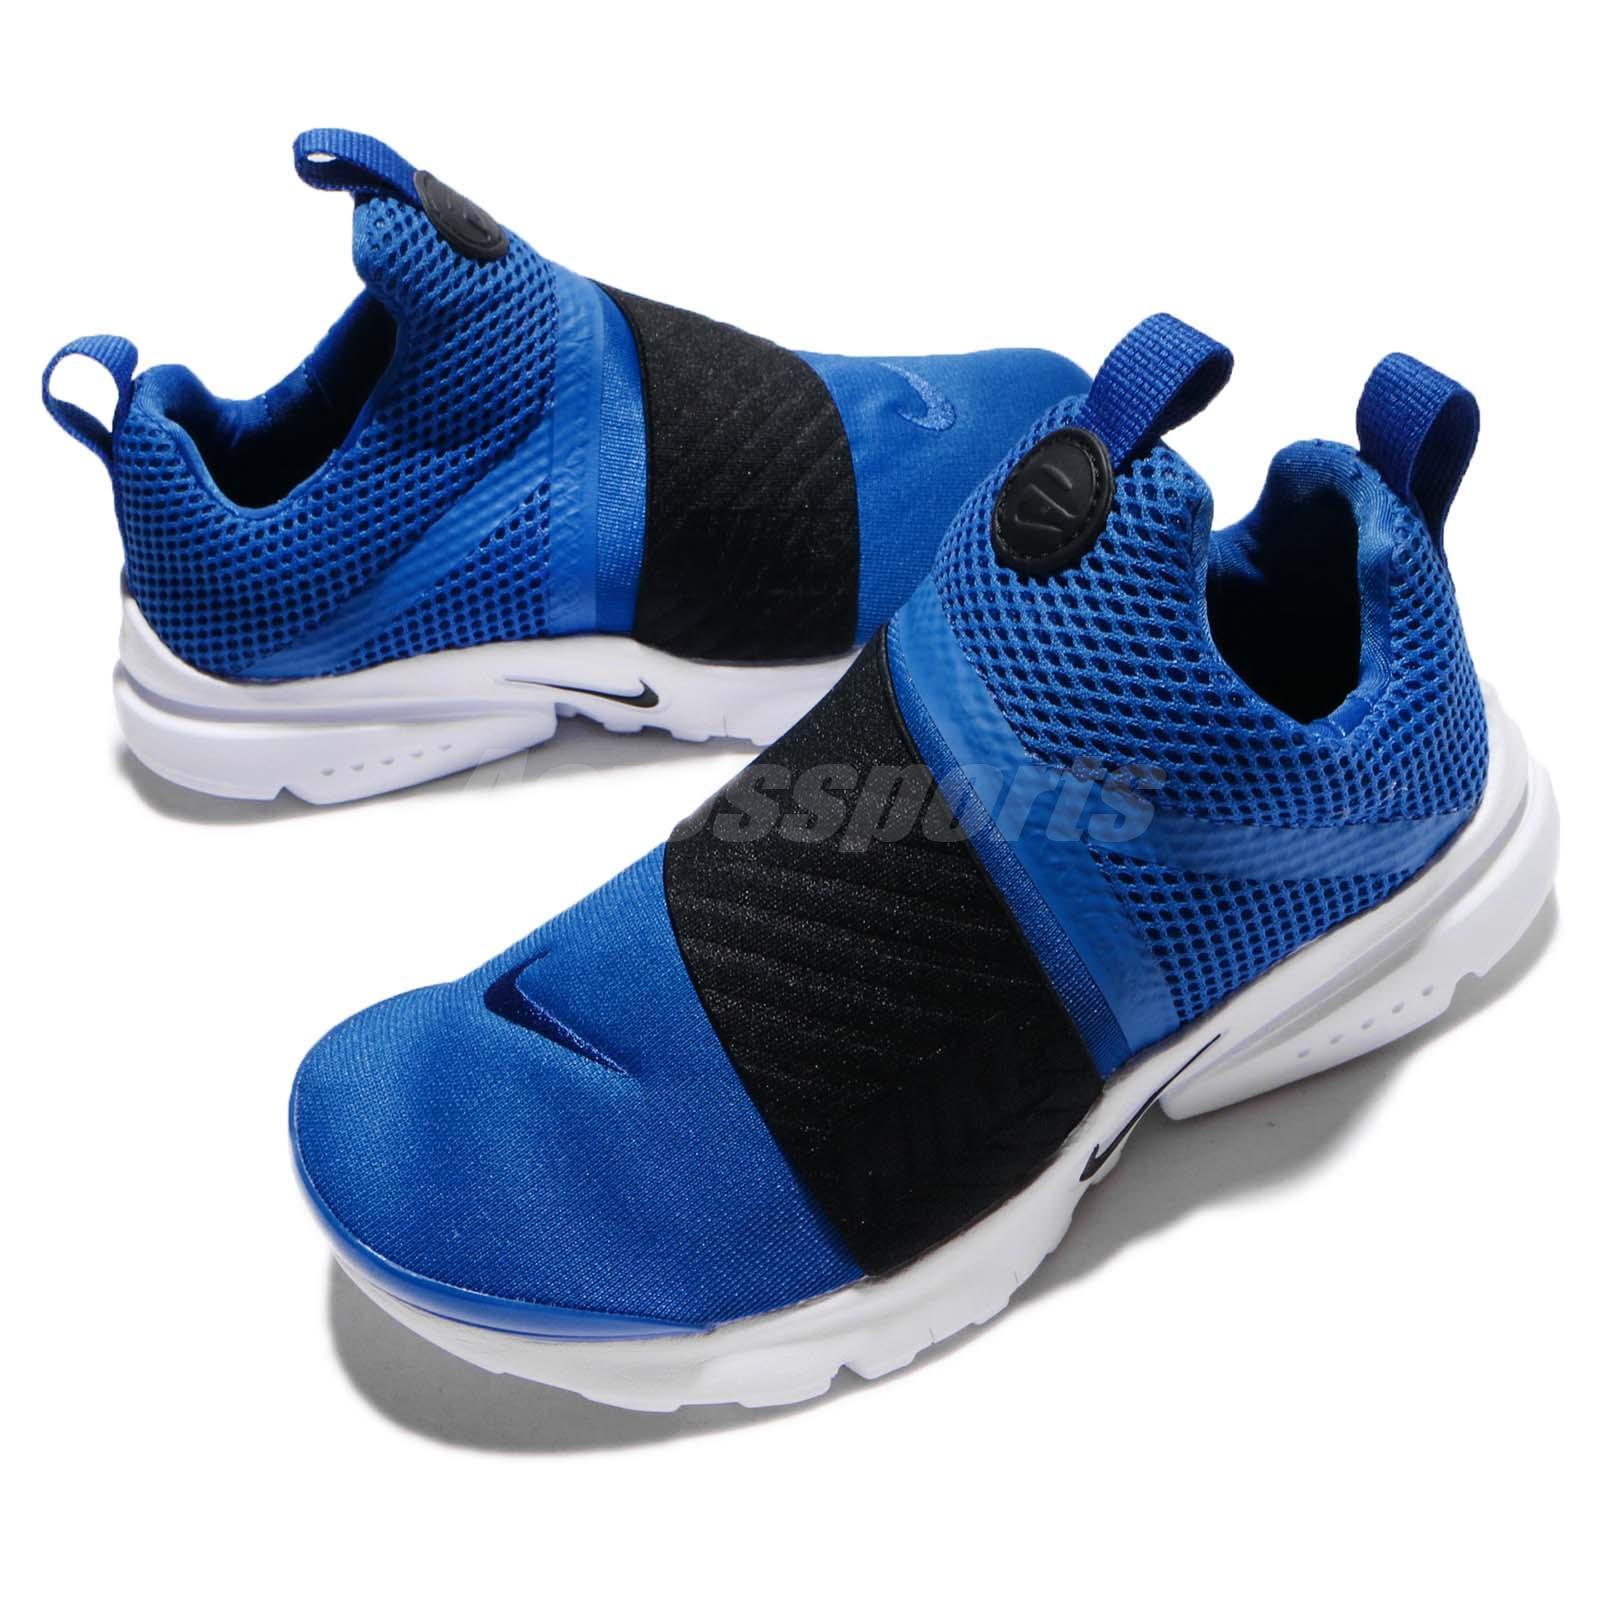 bf0d11adb838 ... Nike Presto Extreme PS Blue Black Preschool Boys Running Sho ...